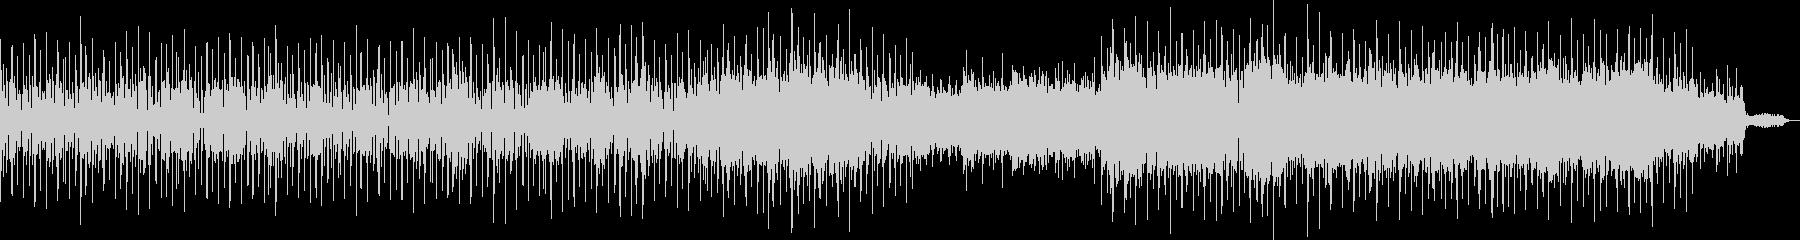 Rhythmical and peaceful BGM's unreproduced waveform